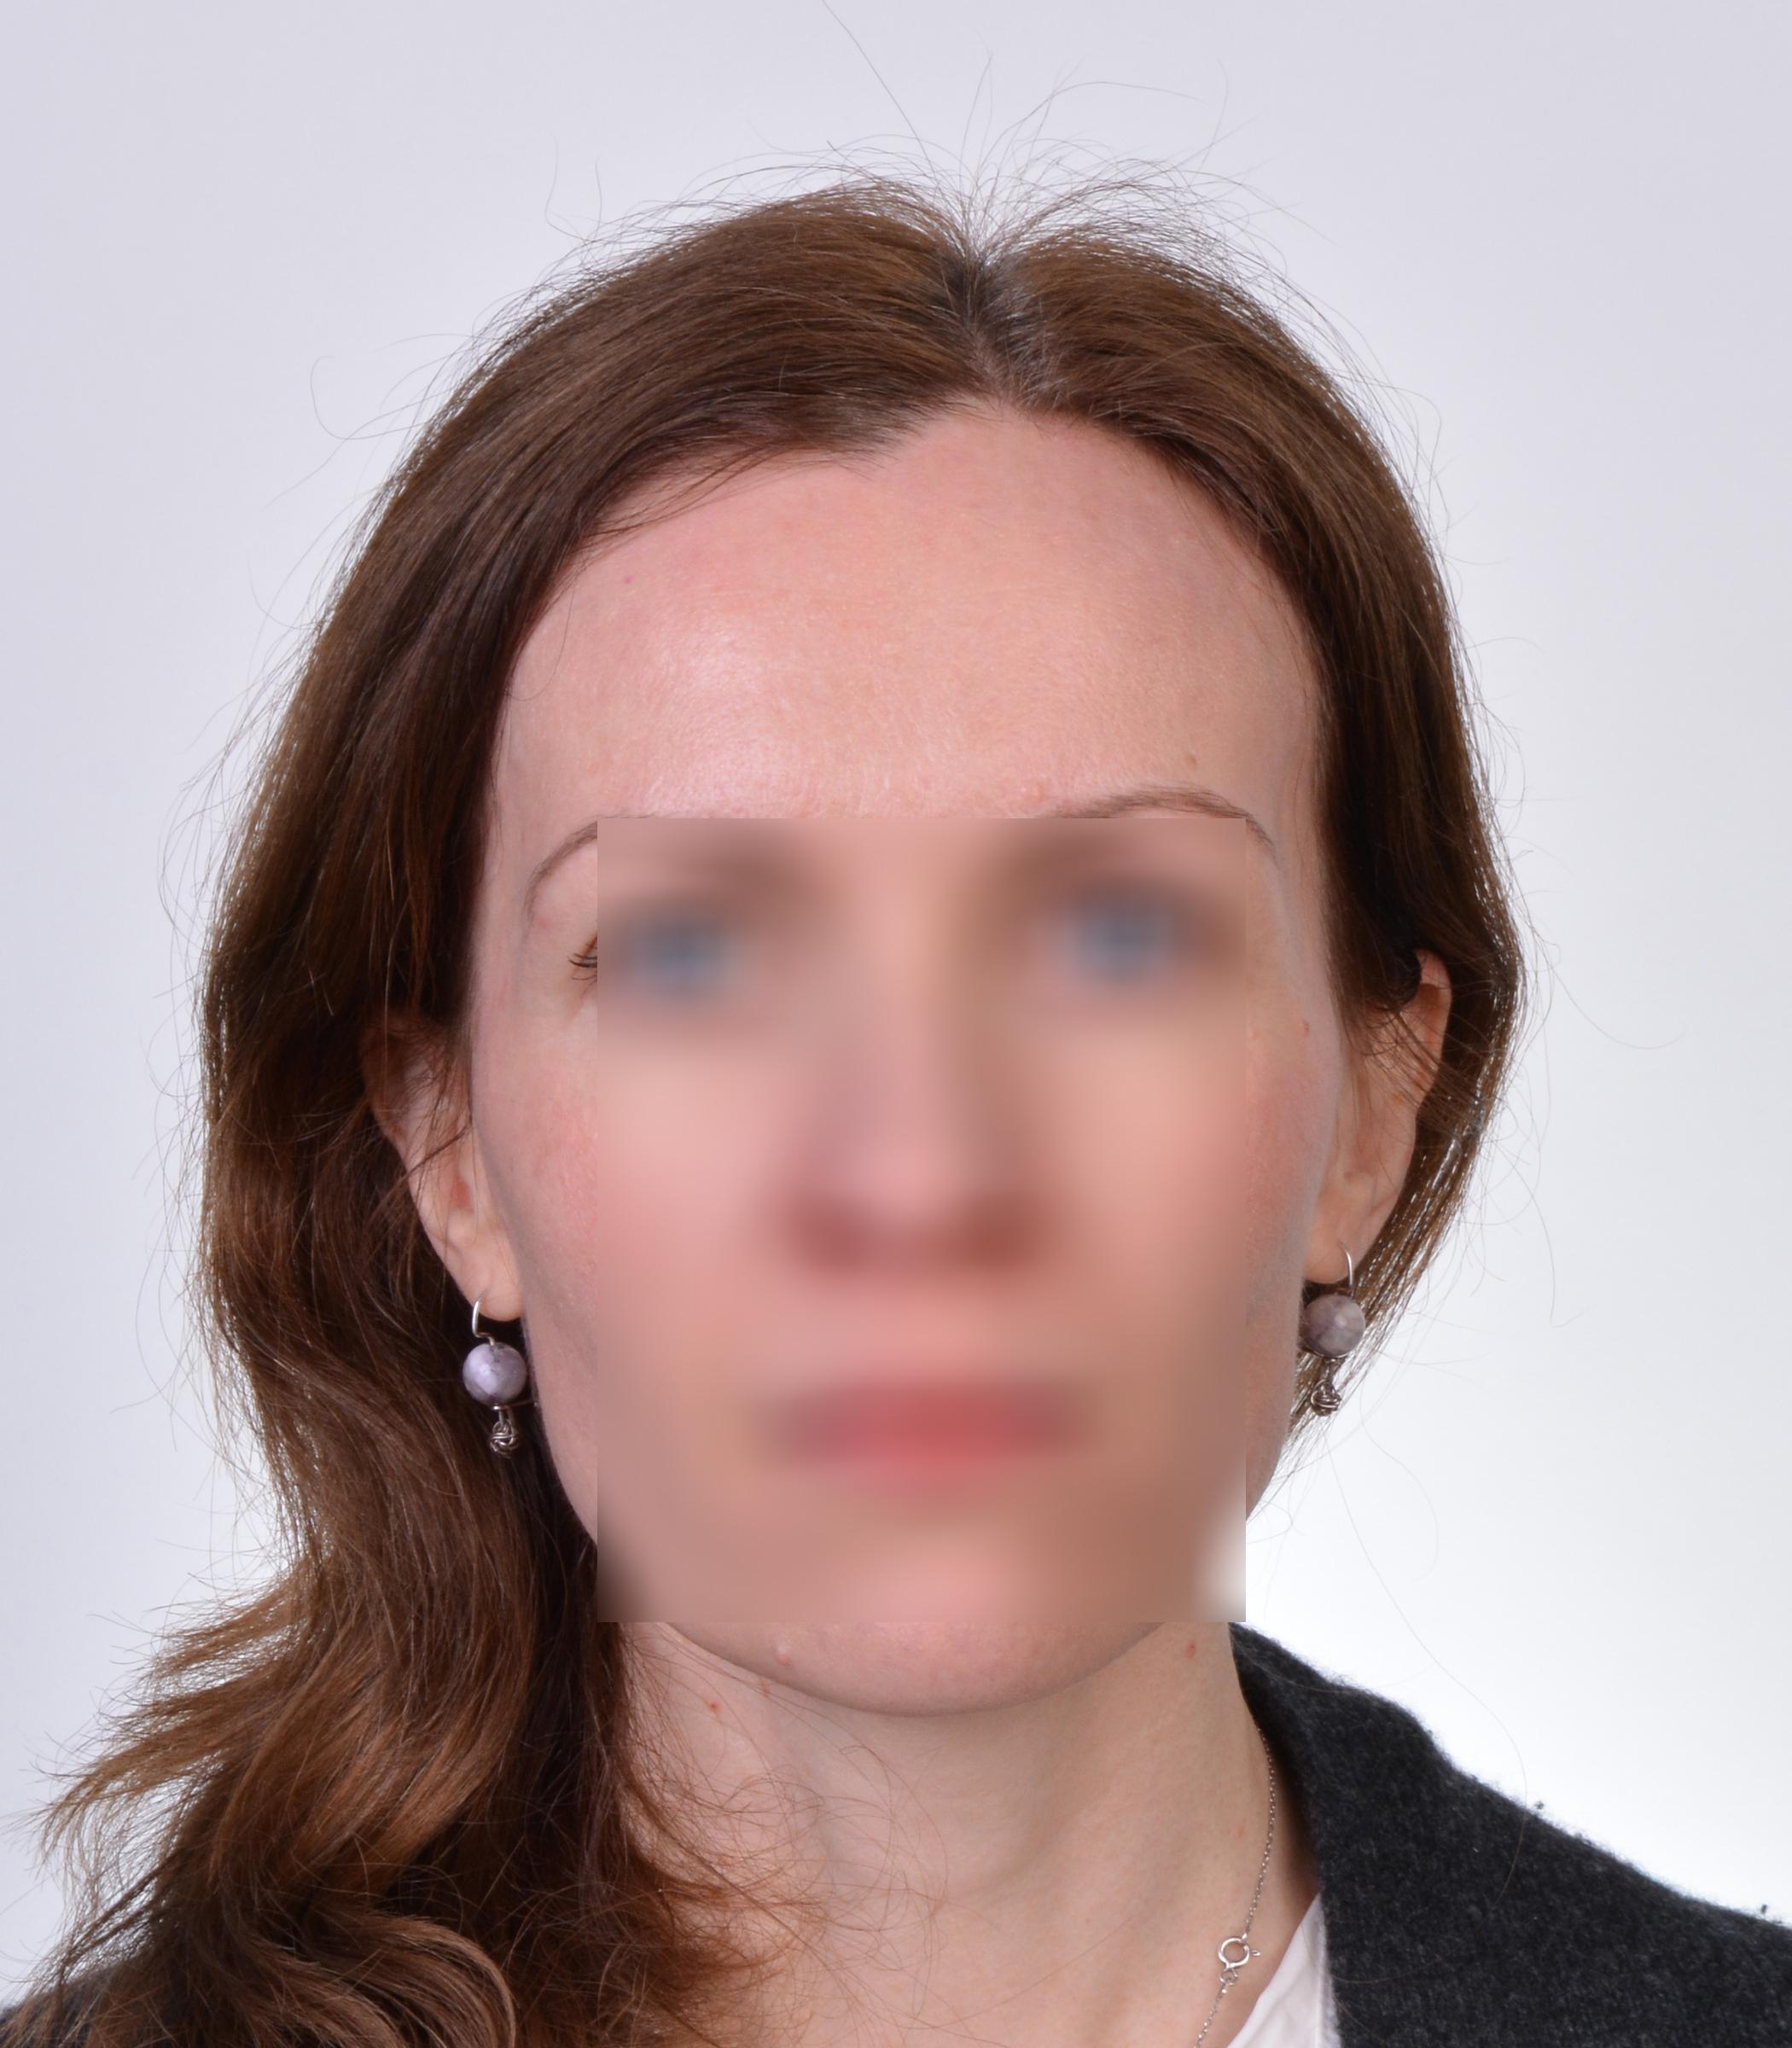 Estonia Passport photo